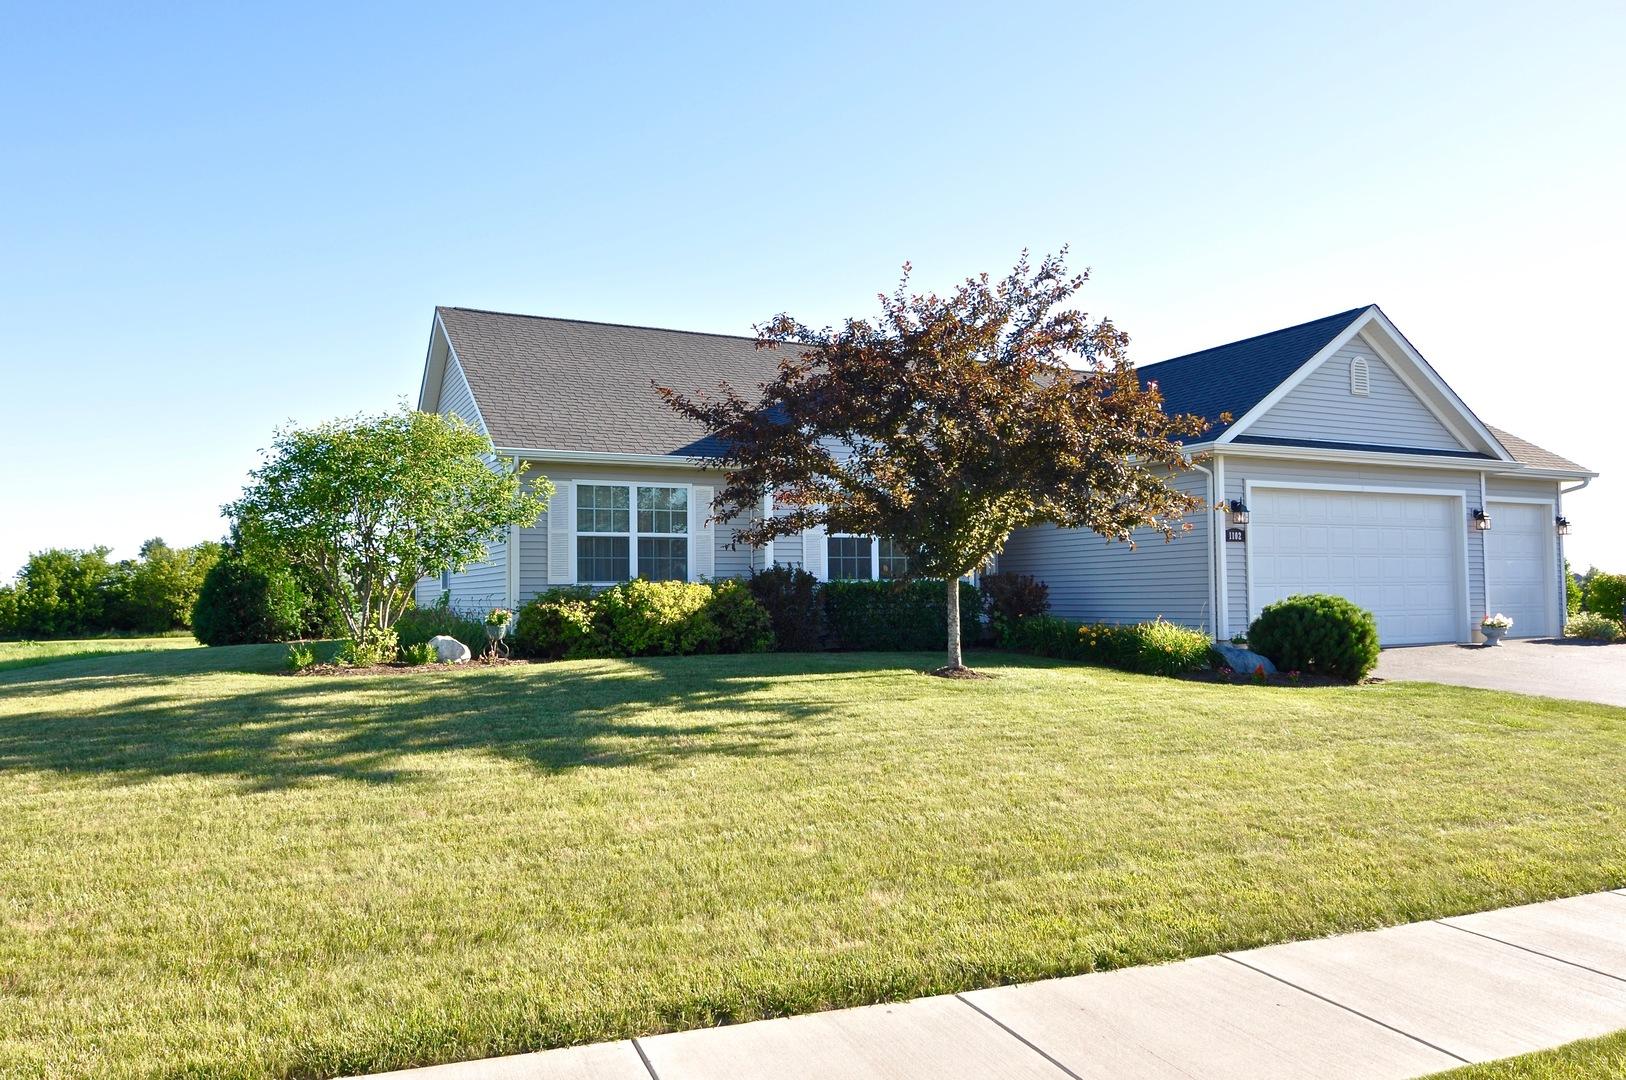 1102 Heron Creek Drive Sycamore Il Single Family Home